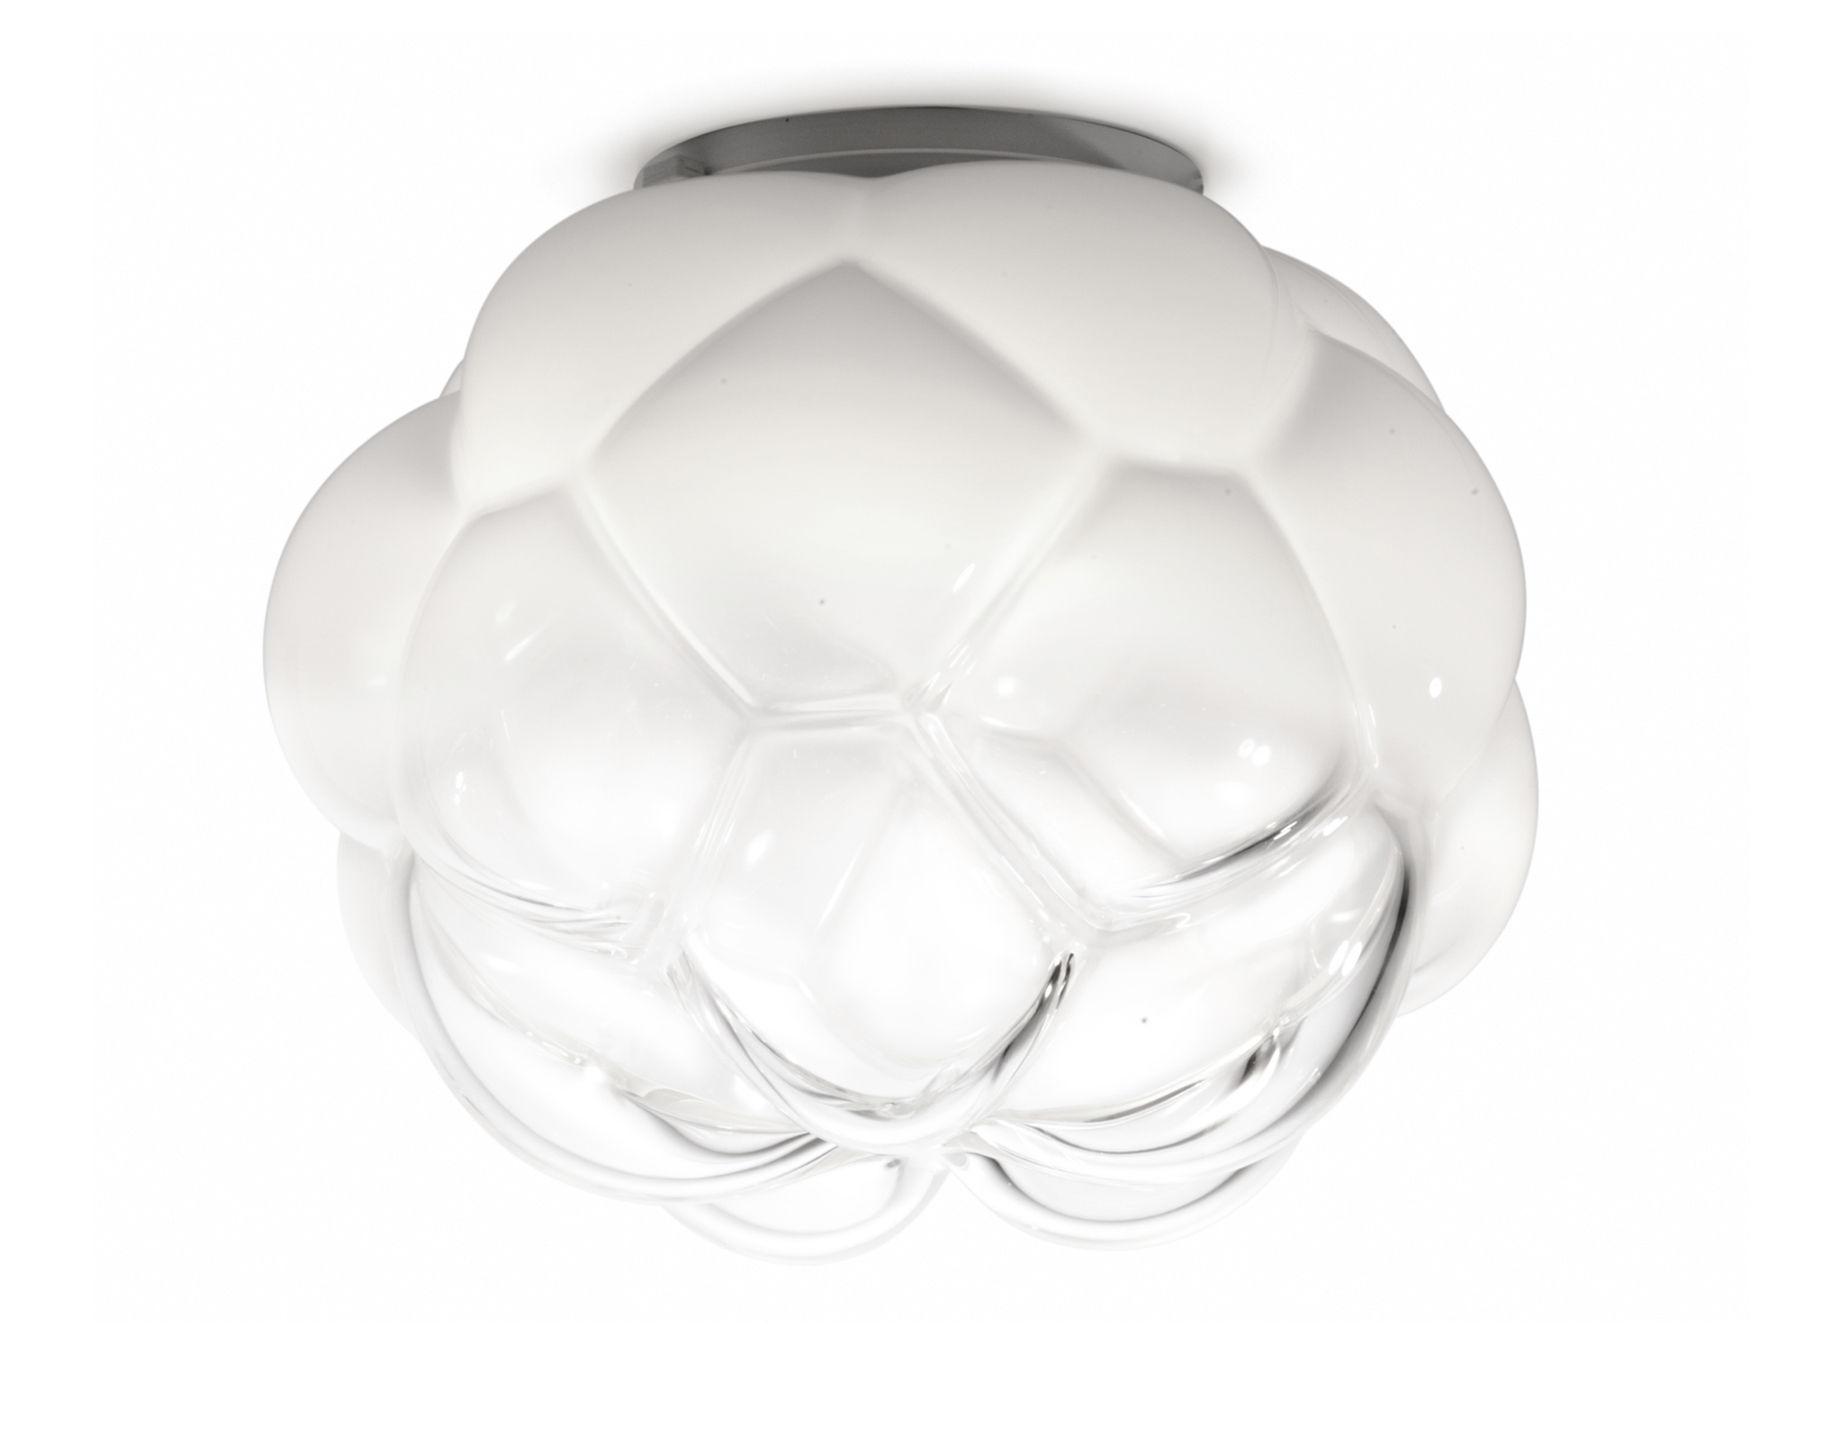 Luminaire - Plafonniers - Plafonnier Cloudy LED / Ø 26 cm - Fabbian - Ø 26 cm / Blanc & transparent - Aluminium, Verre soufflé